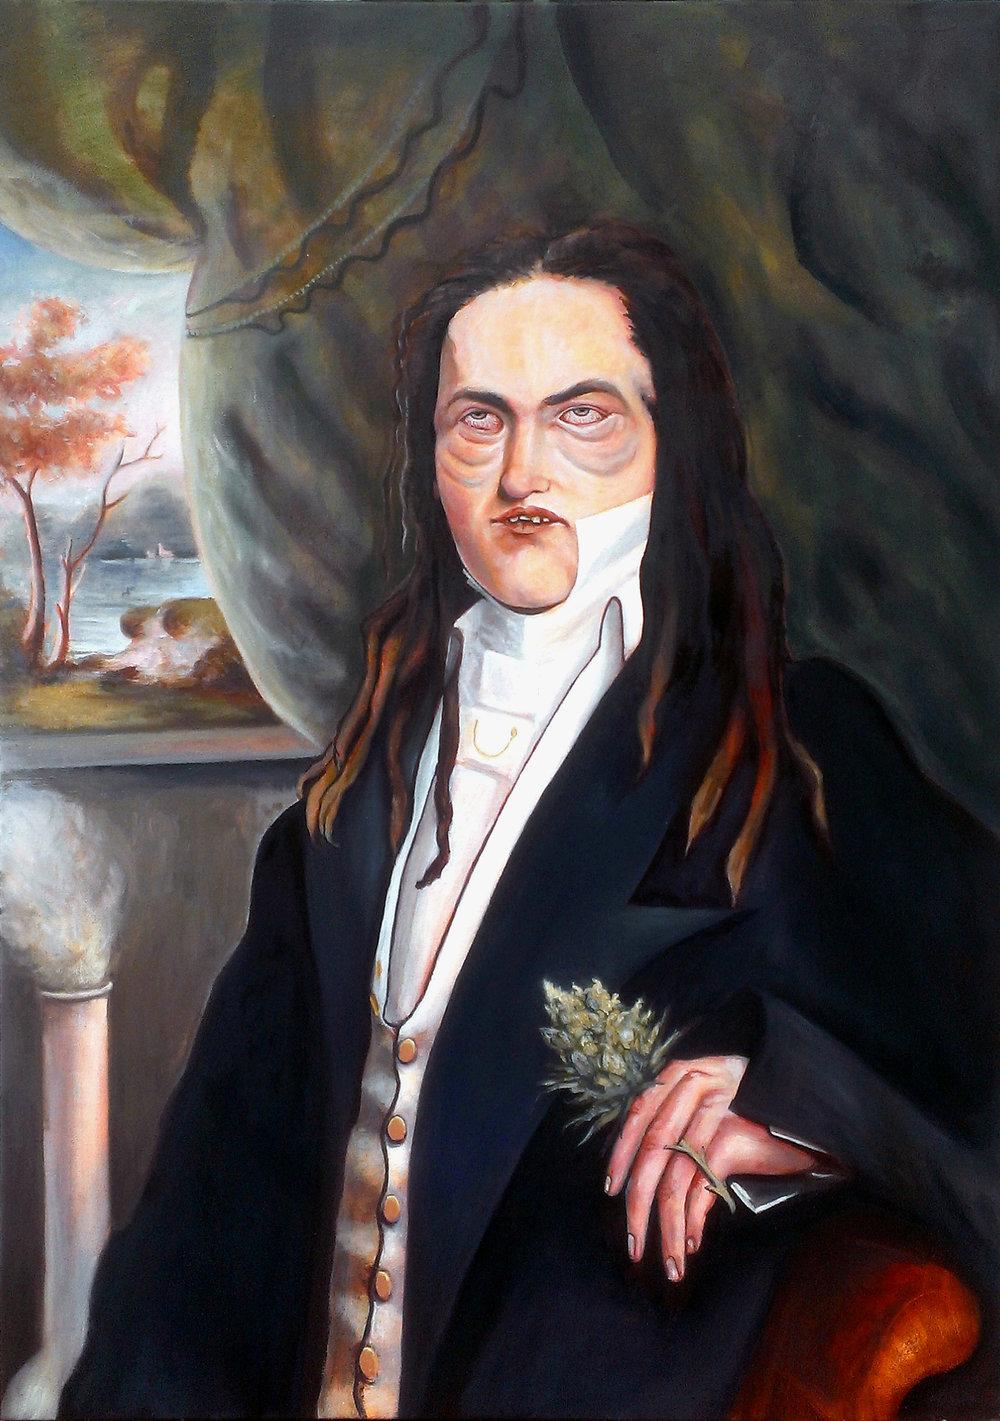 Trustifarius Wookington III